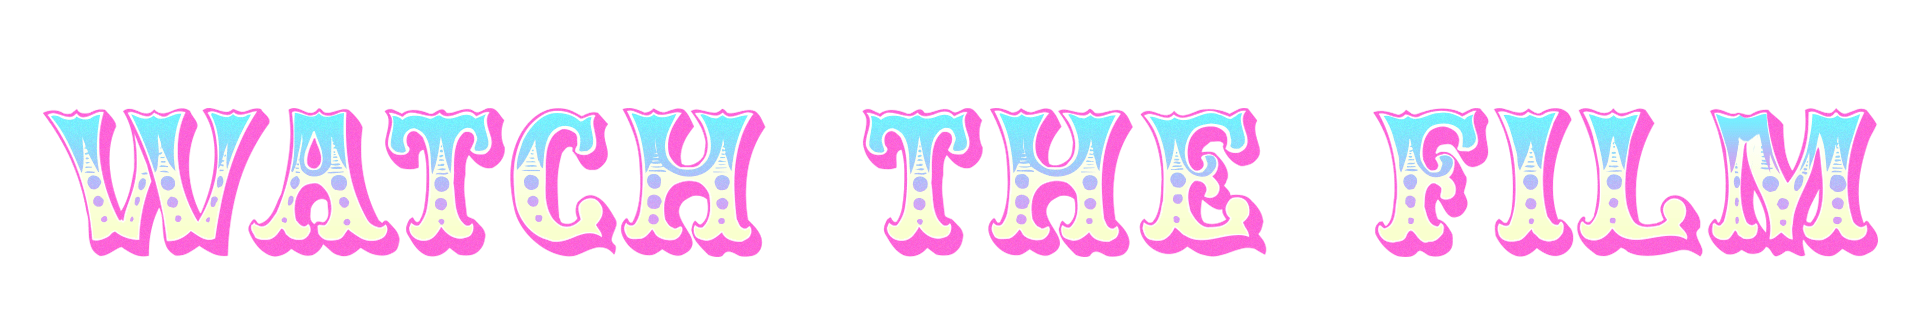 Wta Title